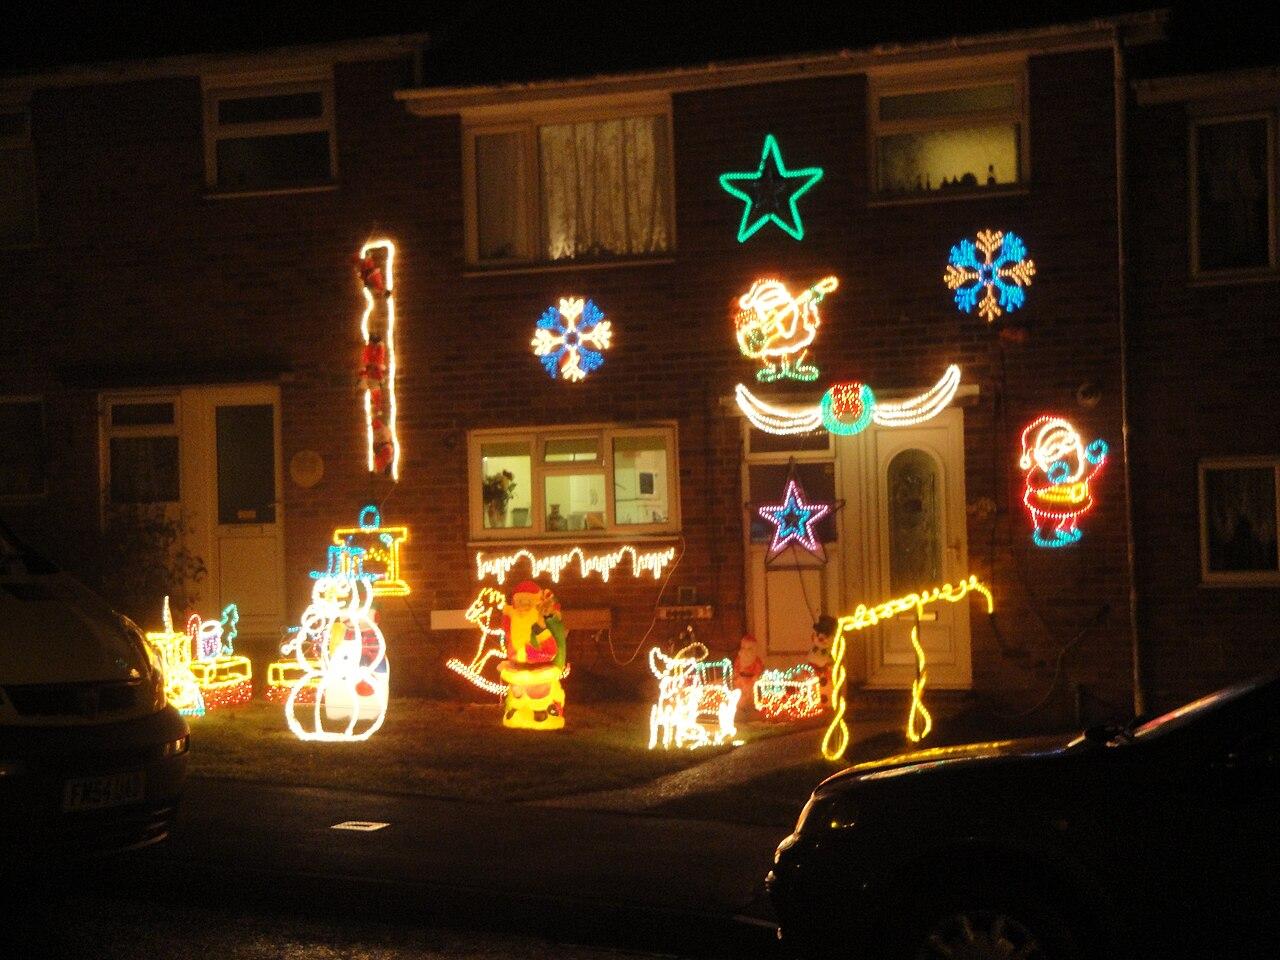 file newport furrlongs top house christmas decorations jpg